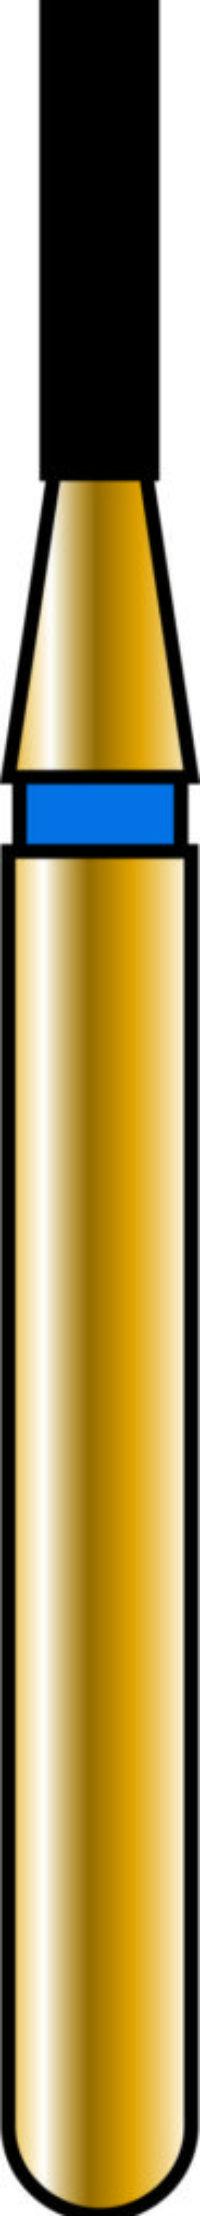 Flat End Cylinder 10-4mm Gold Diamond Bur